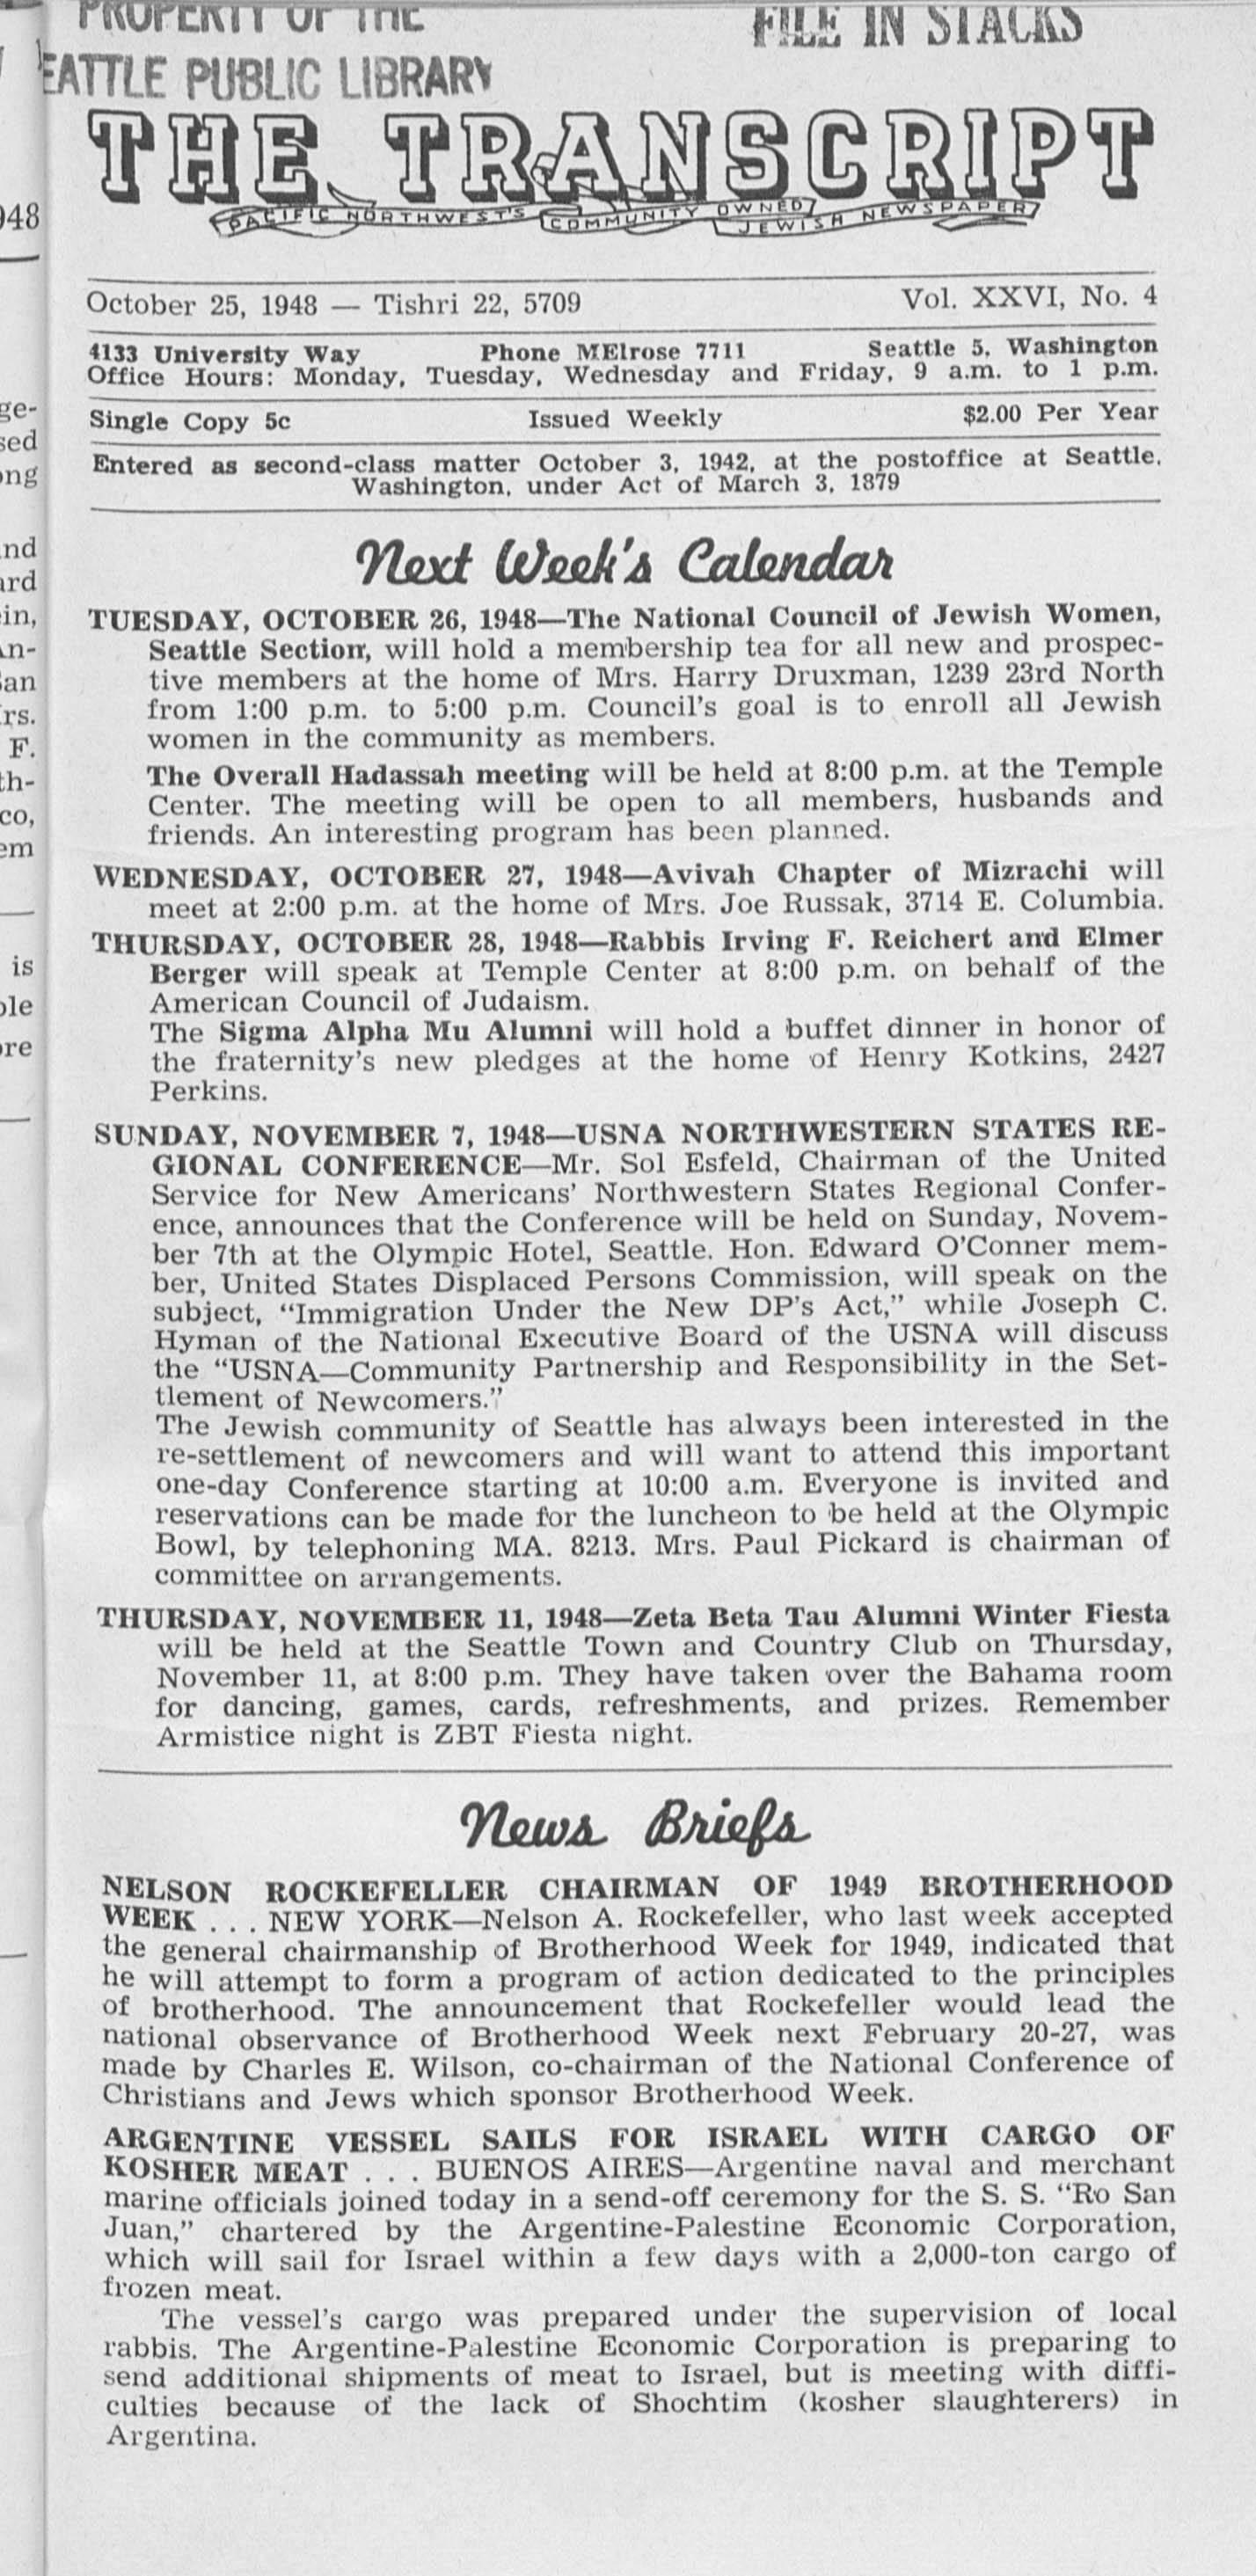 Jewish Transcript, v. 26, no. 4,  Oct. 25, 1948